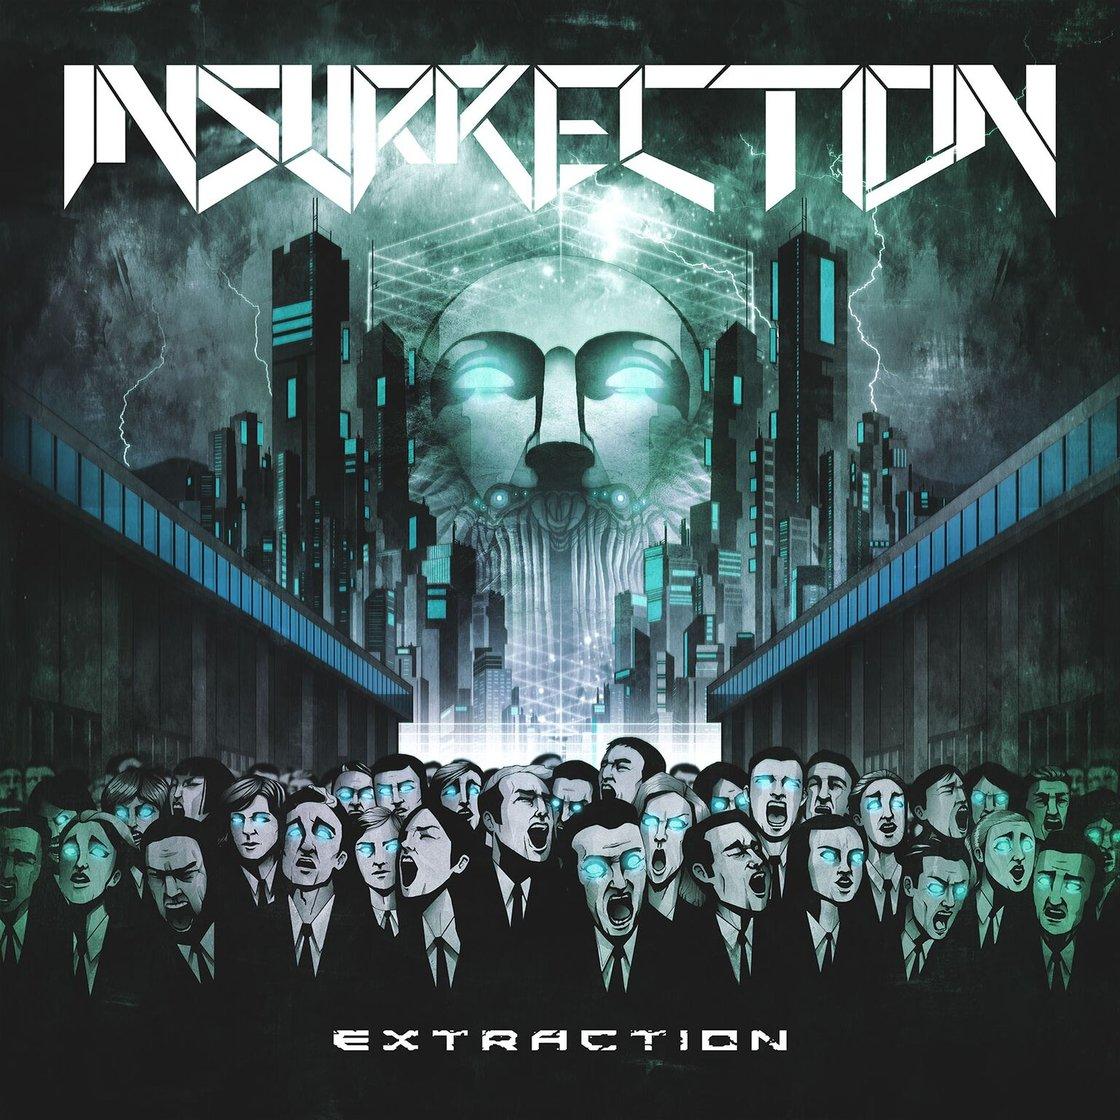 Image of INSURRECTION - Neuraxis - THE LAST FELONY - Vortex - Ghoulunatics, etc